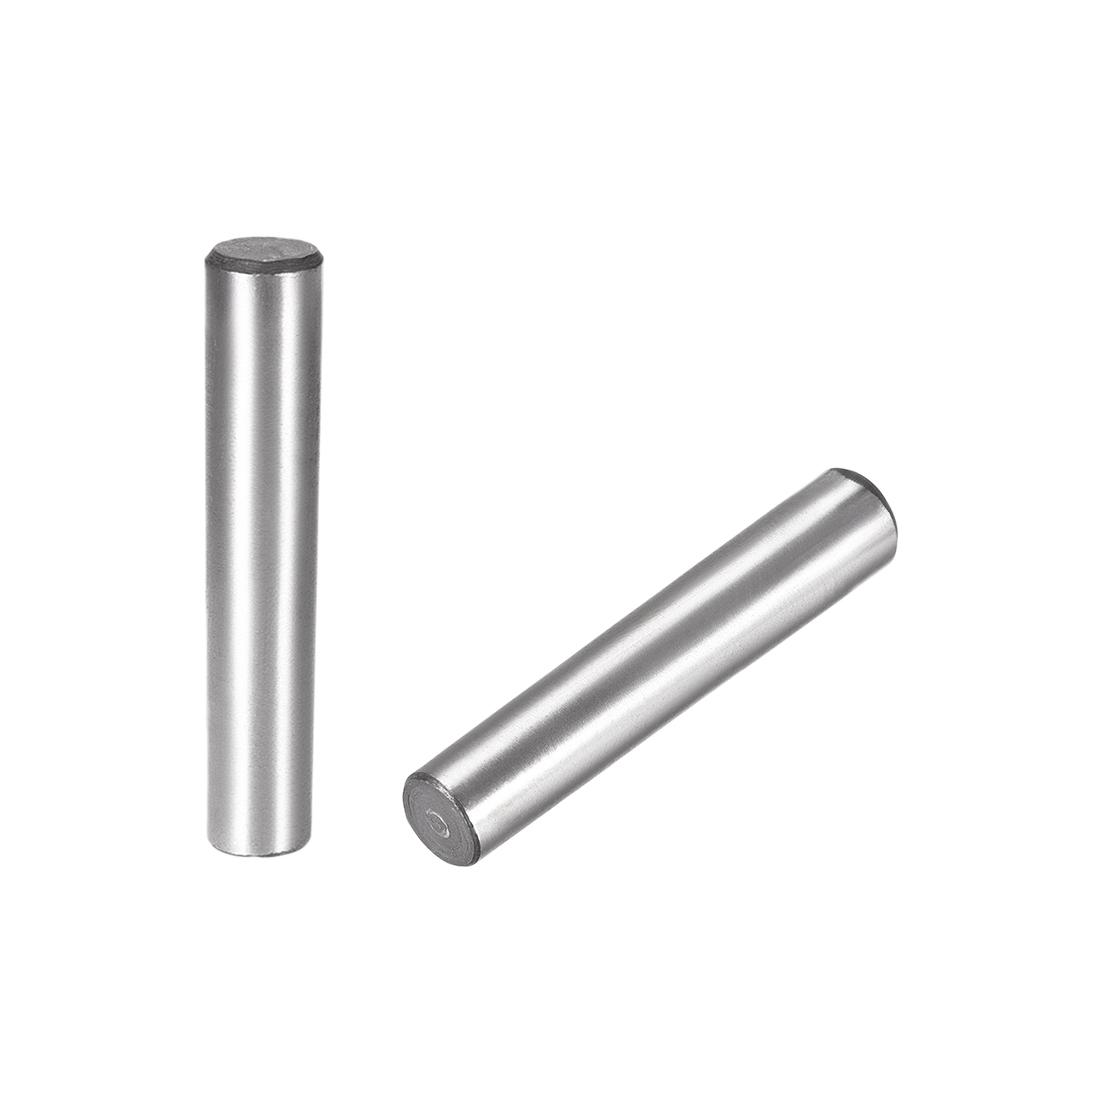 Carbon Steel GB117 70mm Length 12mm x 13.4mm Small End Diameter 1:50 2 Pcs